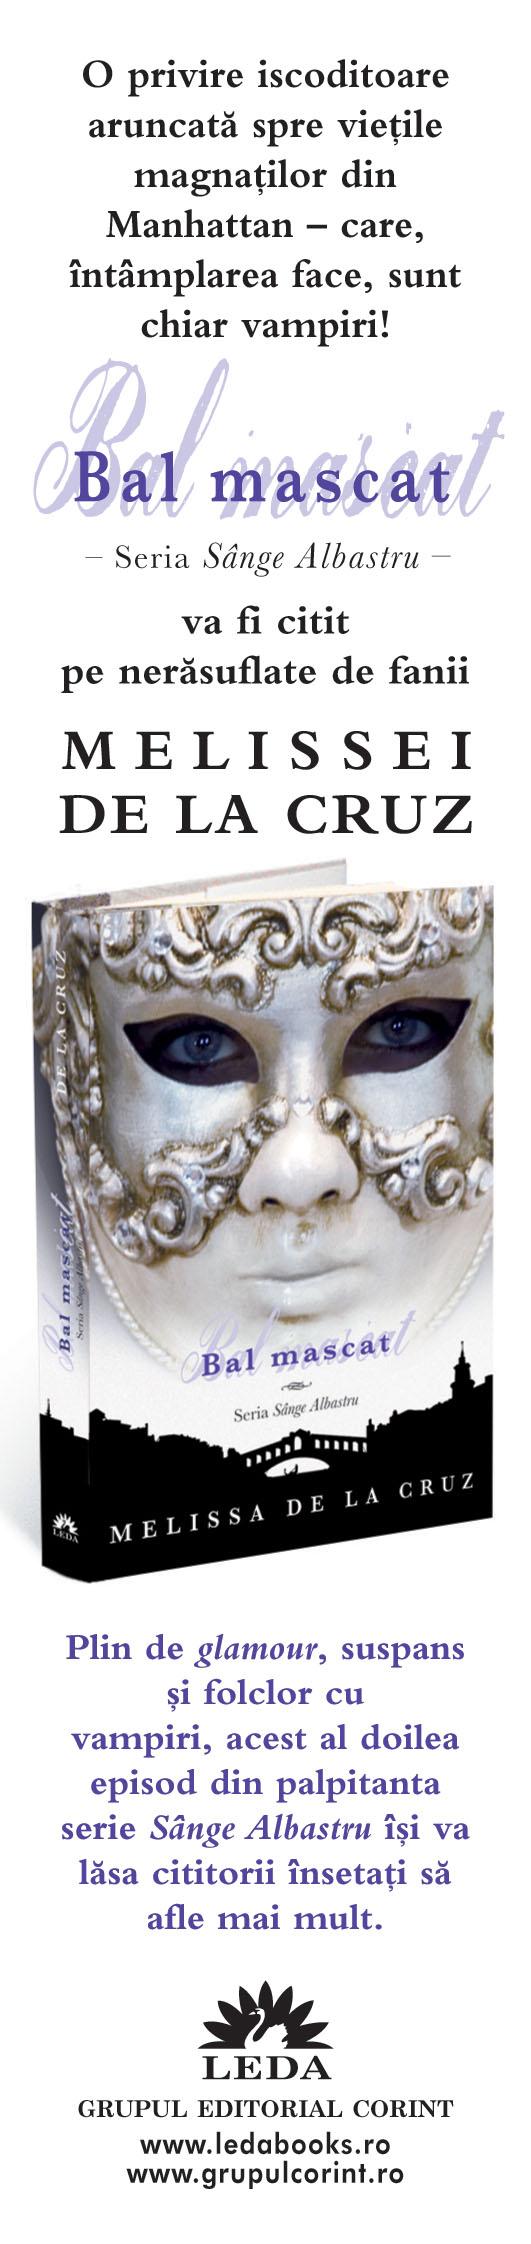 Bal mascat SC